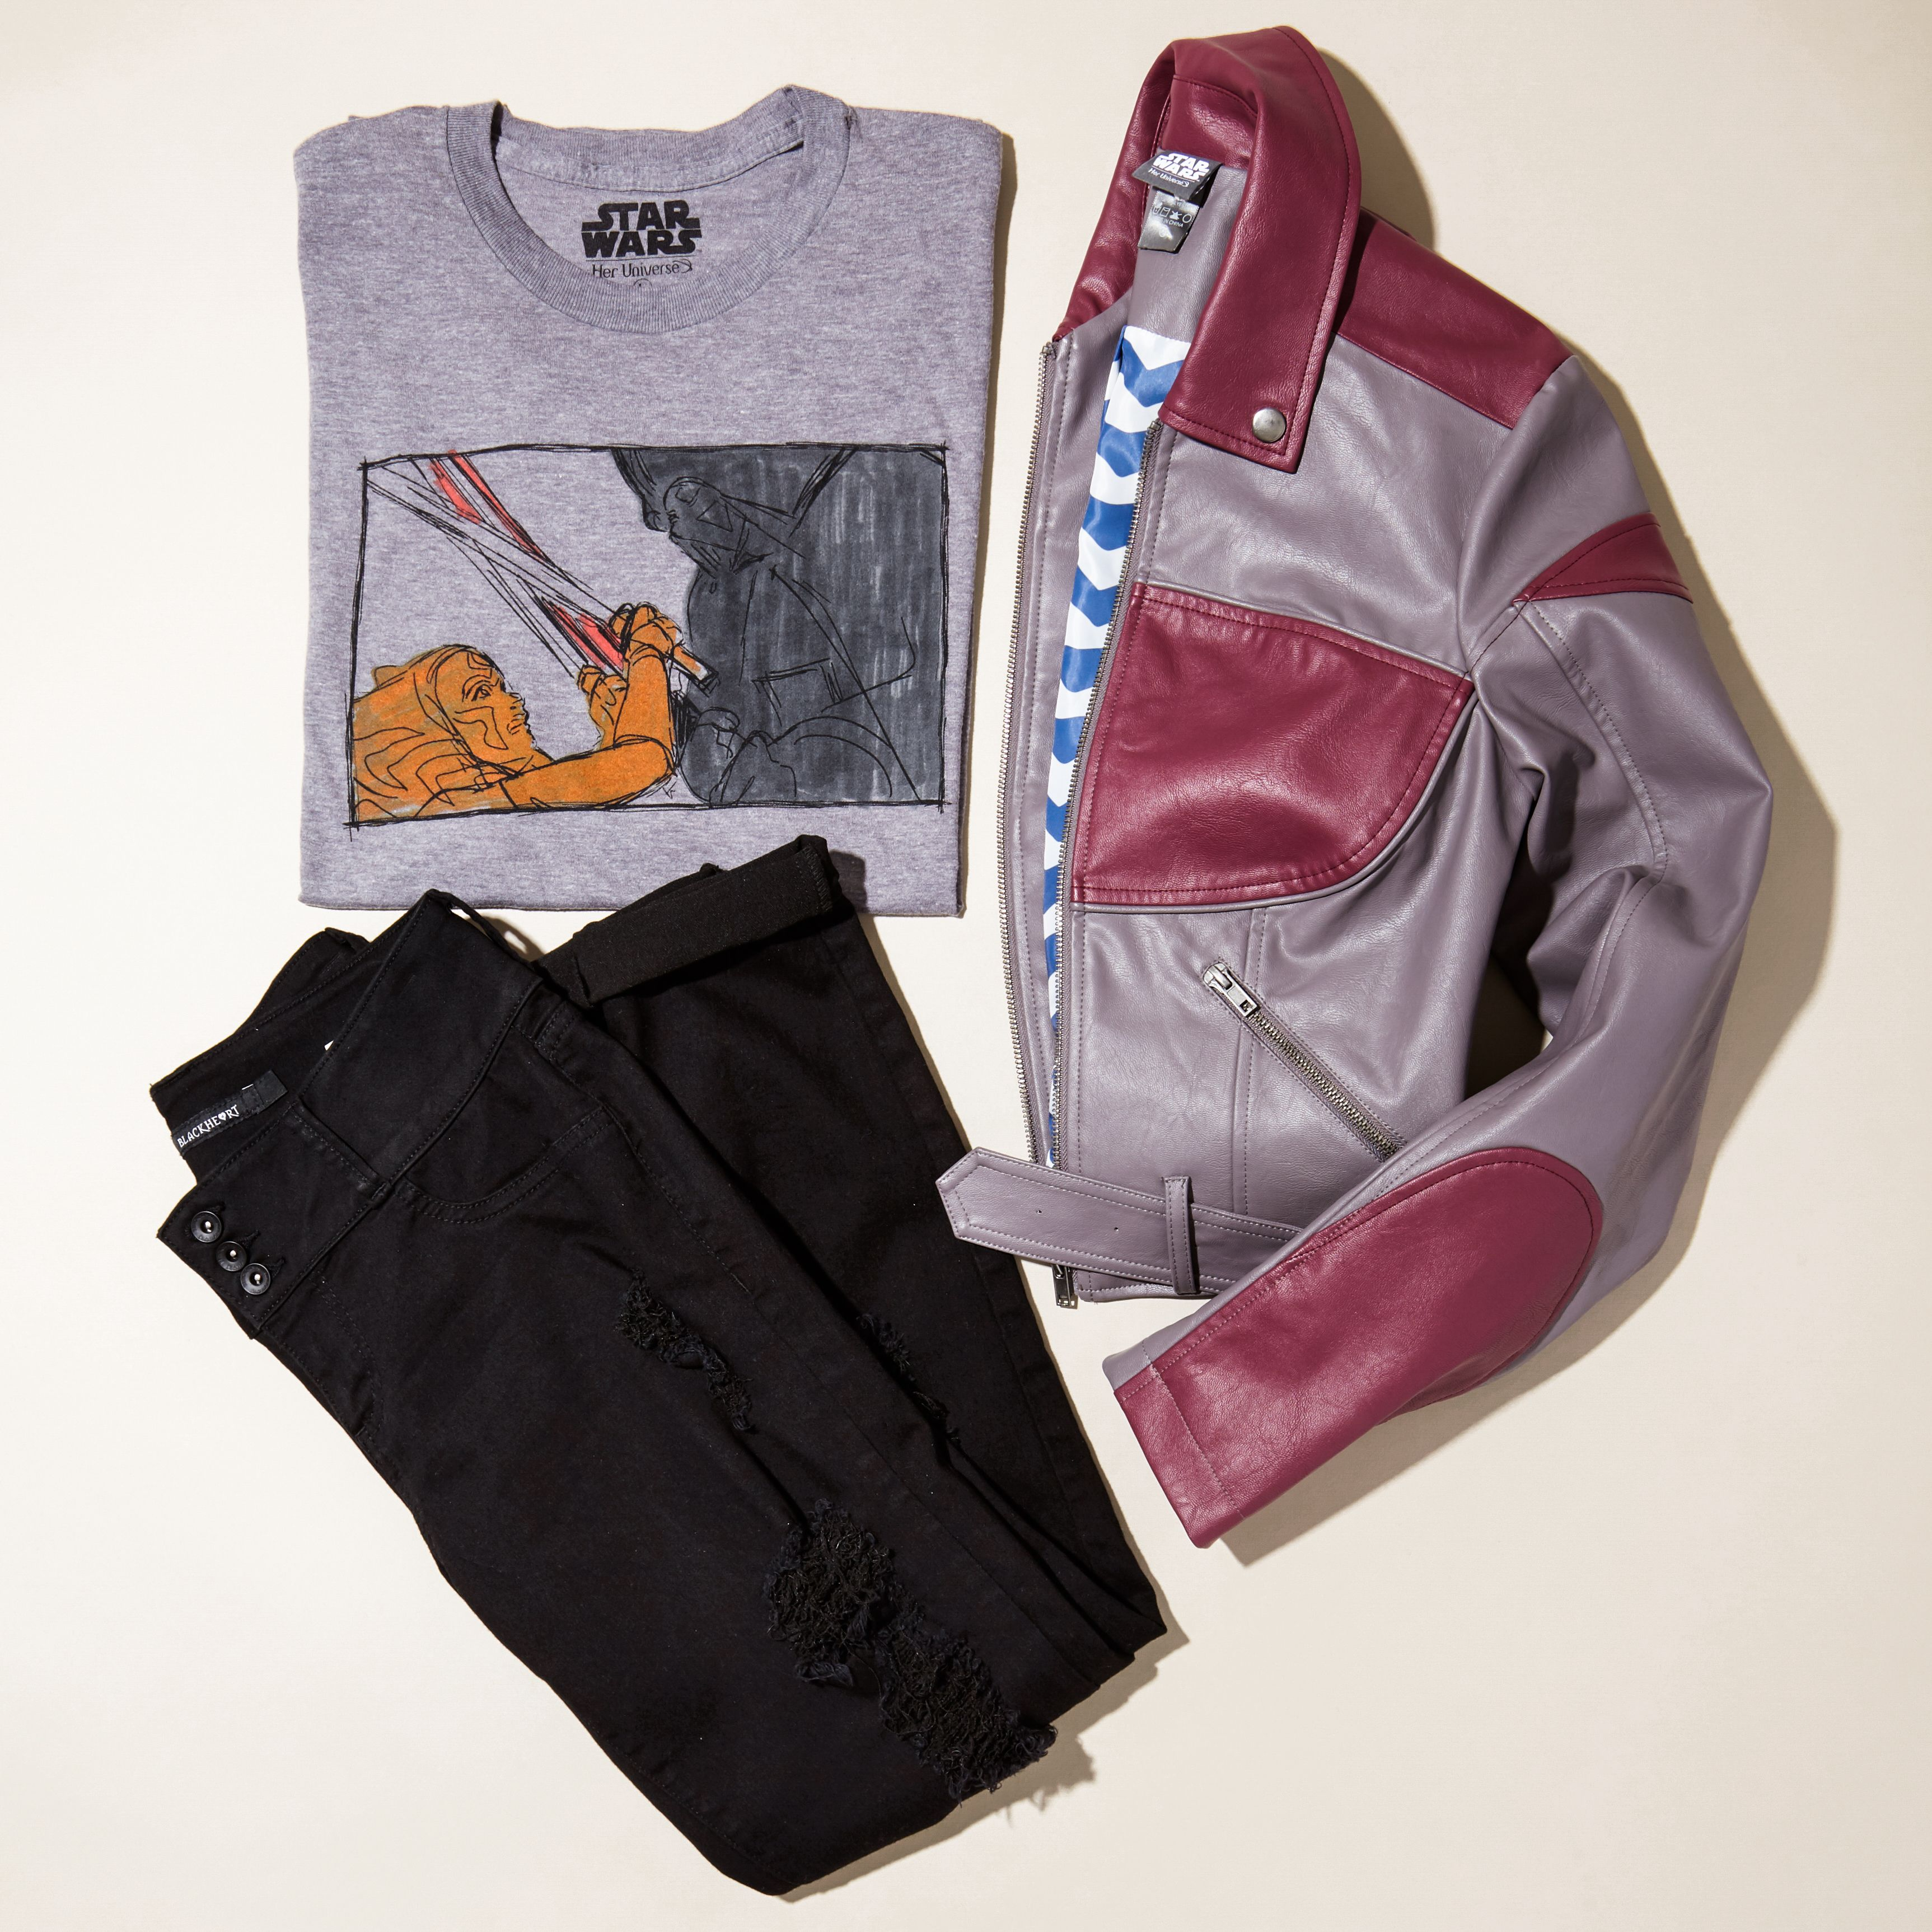 heruniverse tano sweatshirt